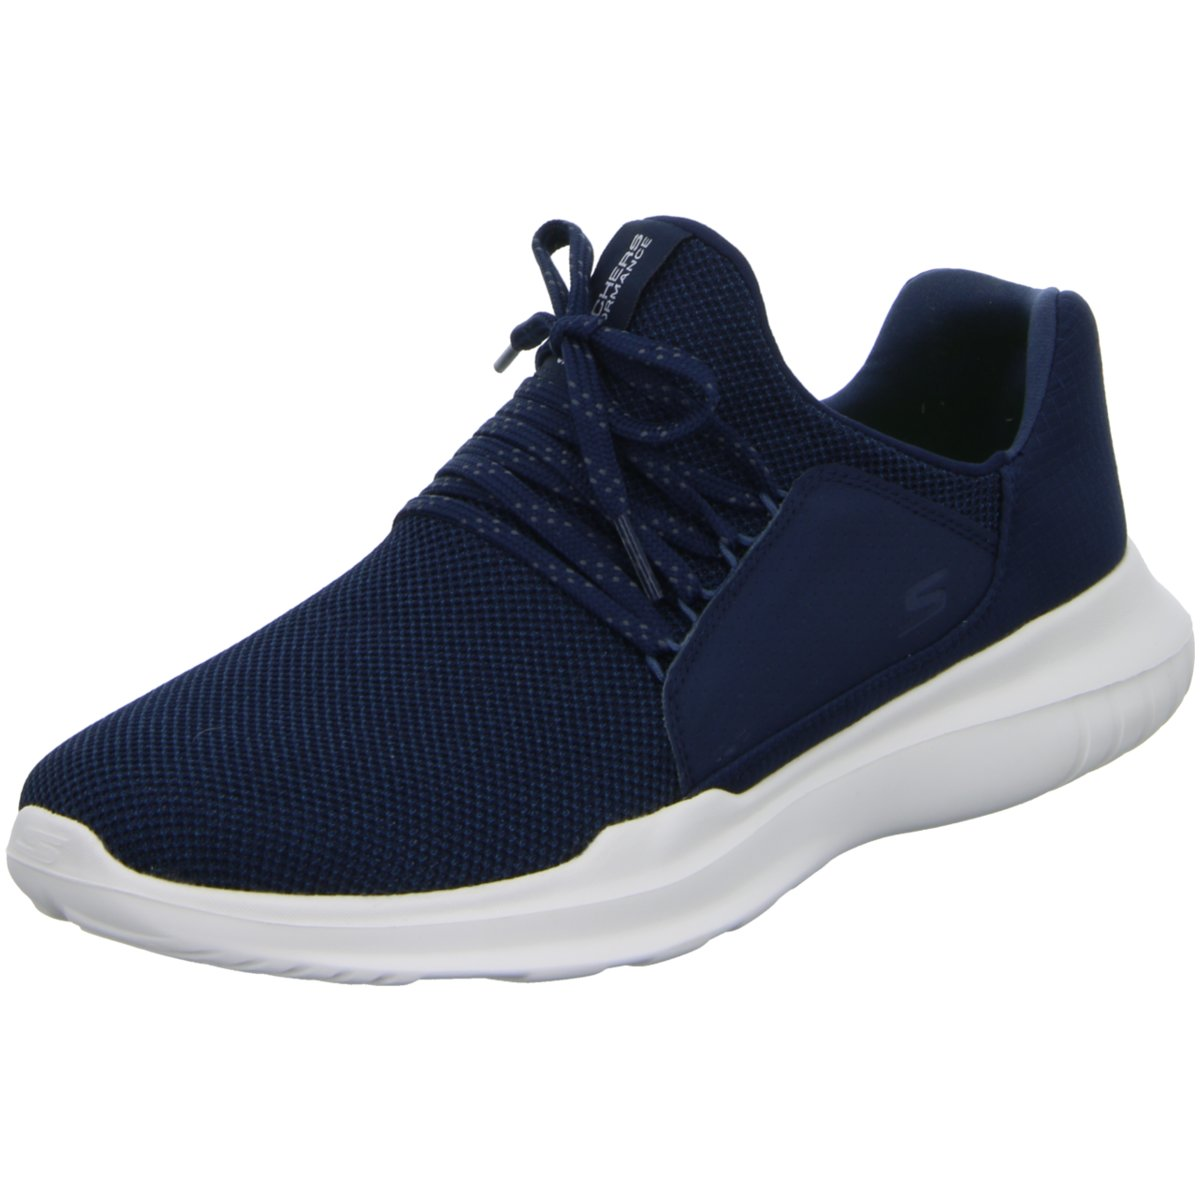 2efe5c204a Das Bild wird geladen Skechers-Herren-Sneaker-Slipper-Halbschuh-Go-Run-Mojo-